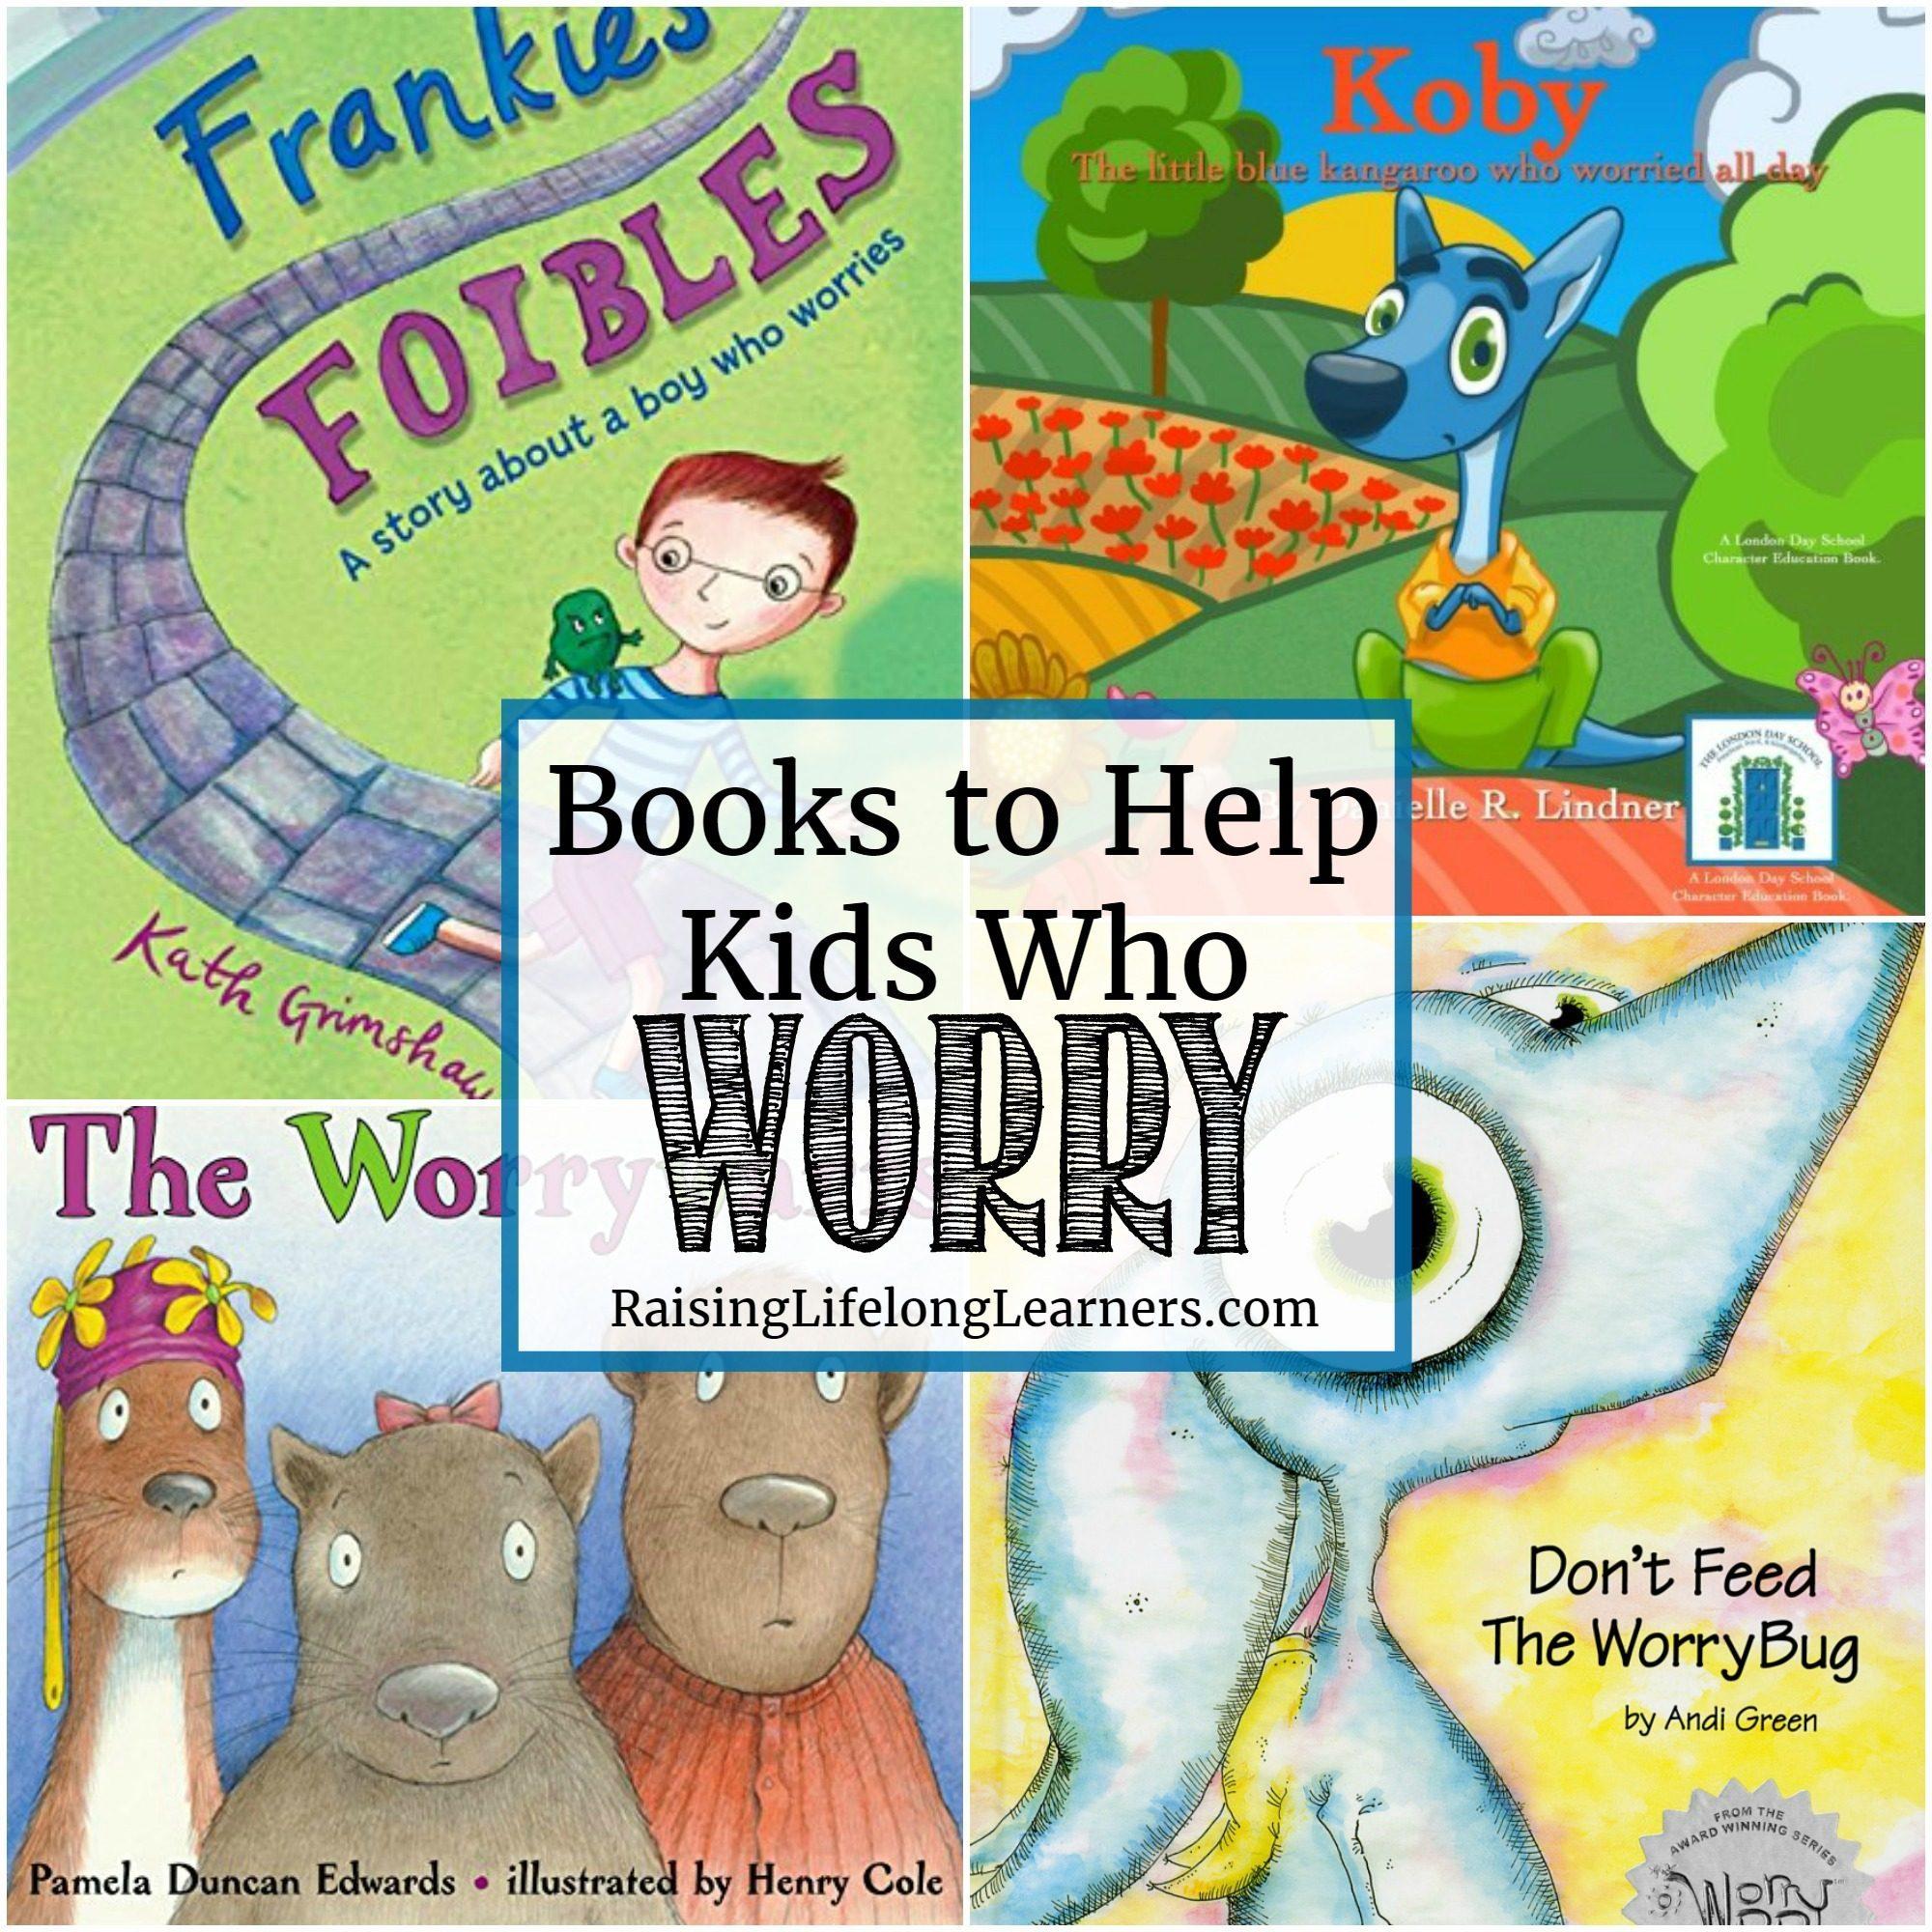 Books to Help Kids Who Worry